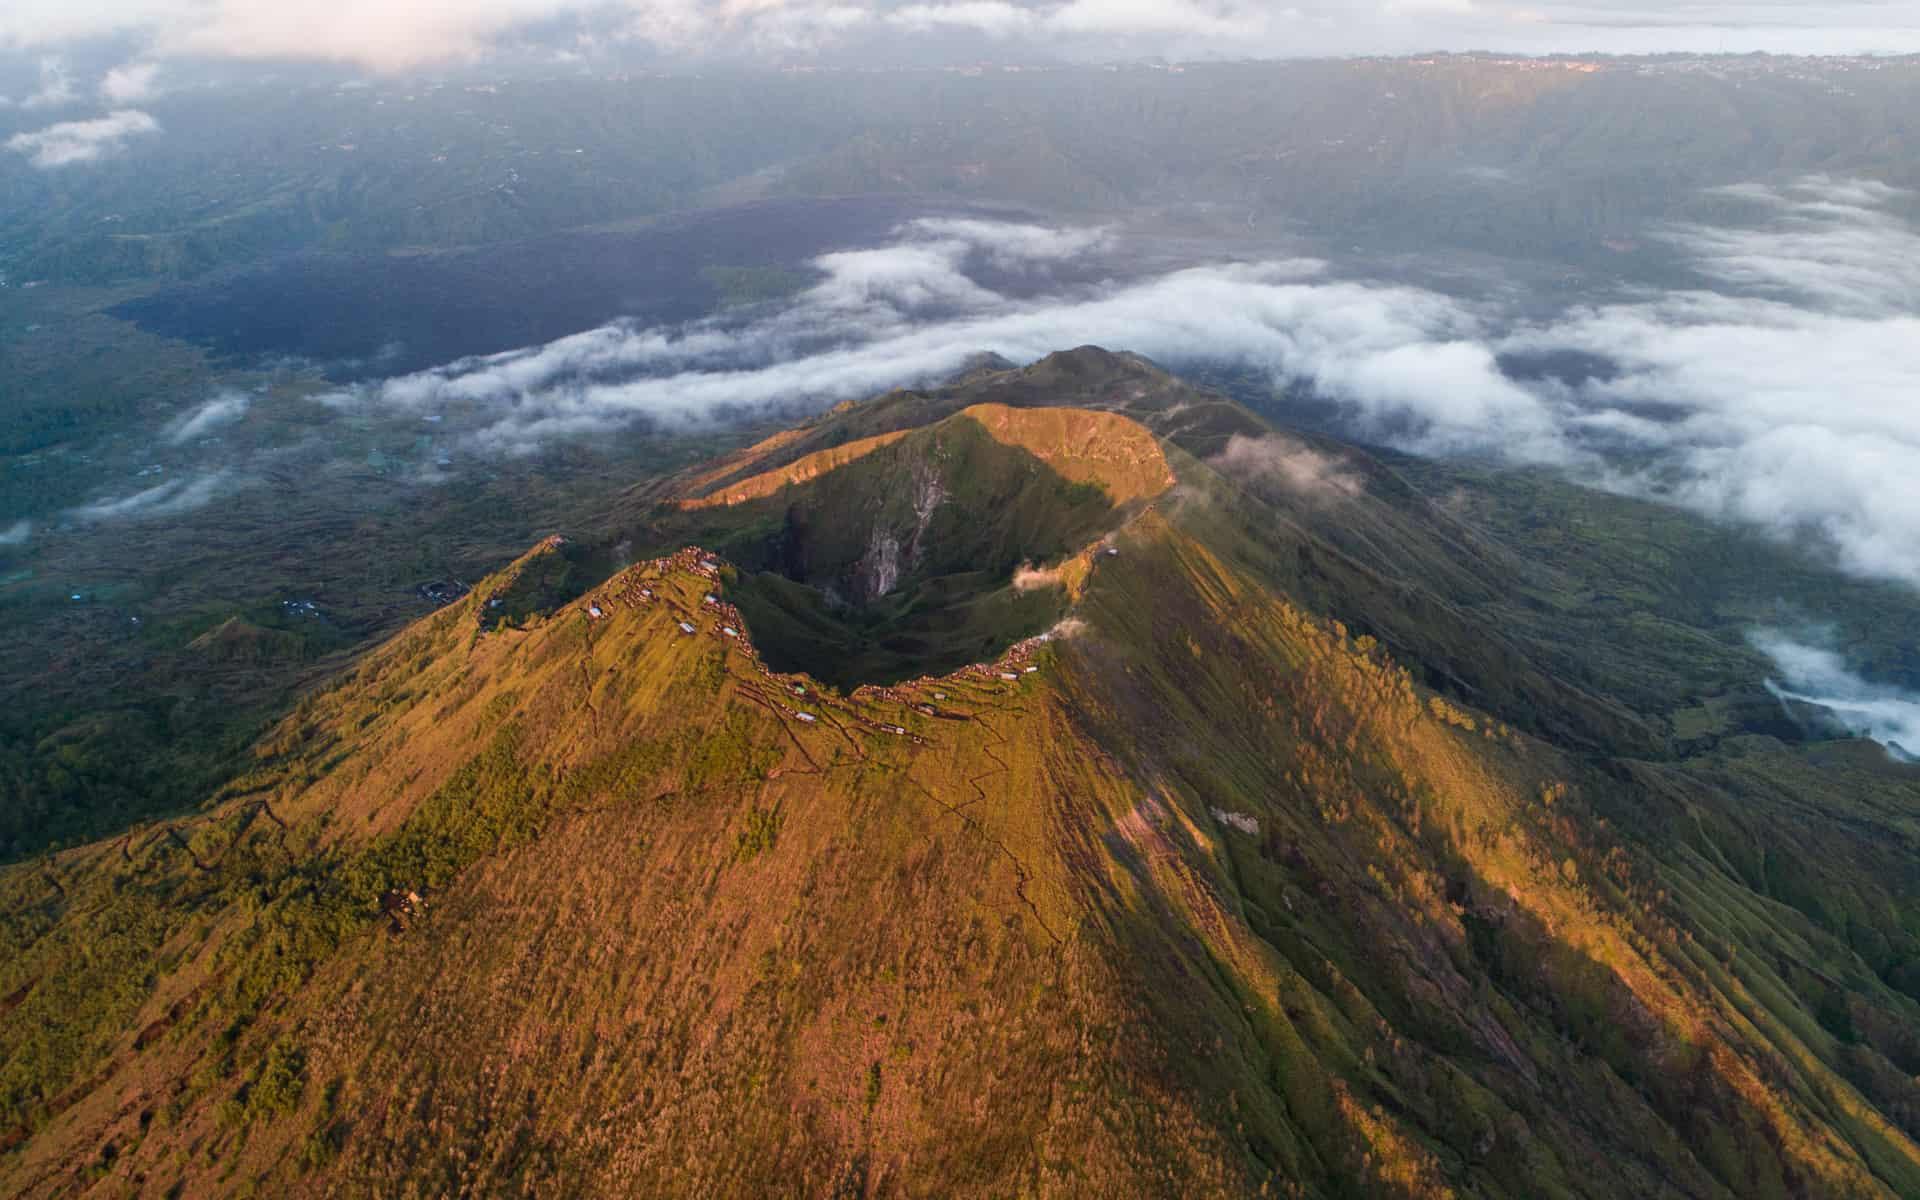 Mount-Batur-sunrise-crater-drone